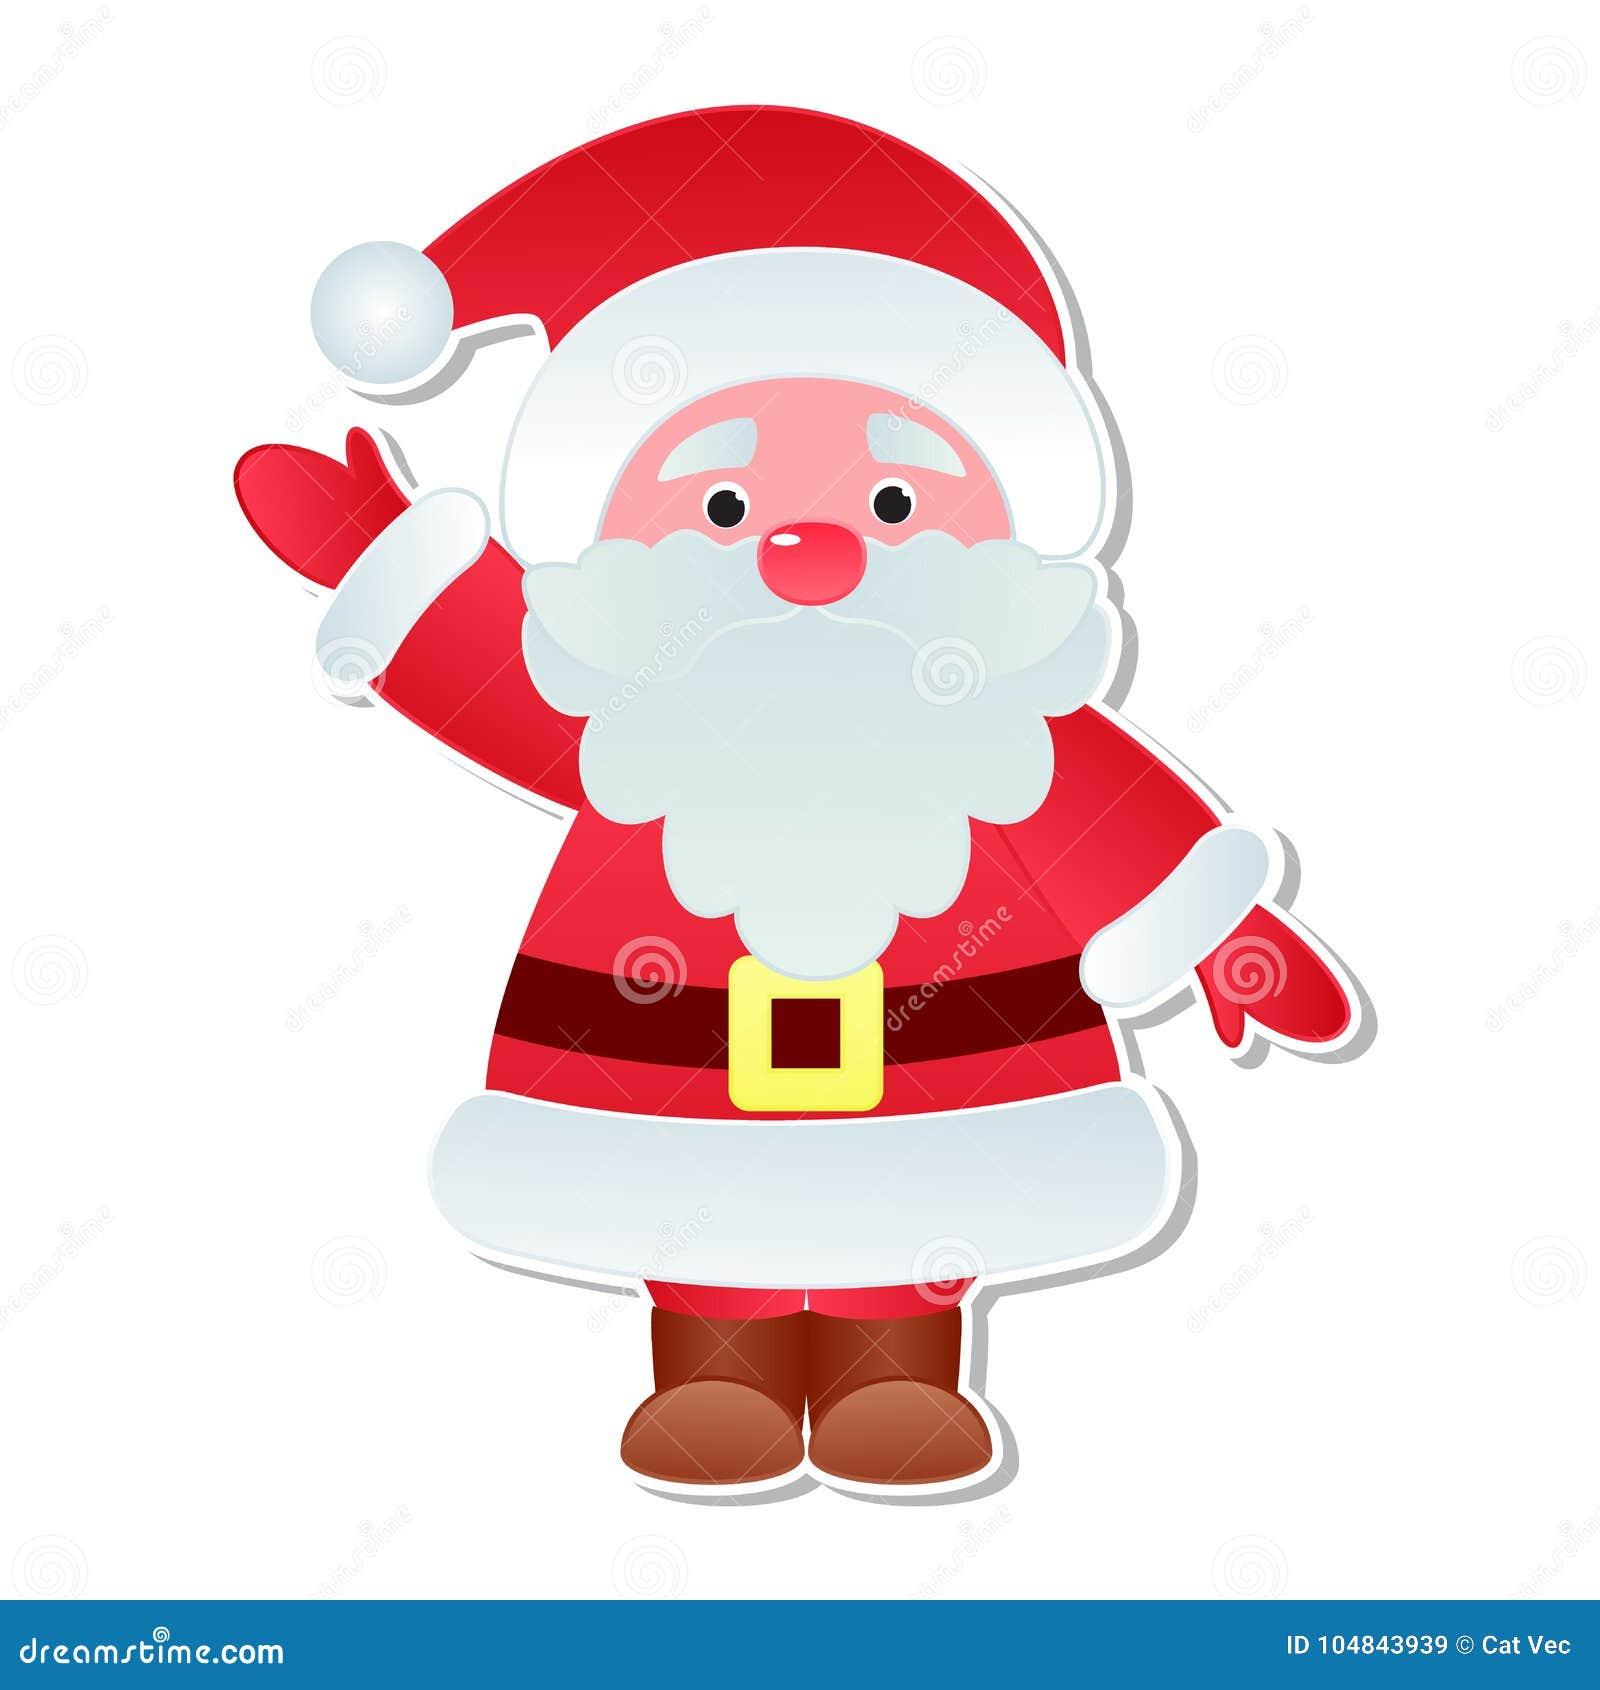 9b34a162bce9b Christmas Santa Claus vector icons character poses Xmas man red traditional  costume cute Santa hat illustration.